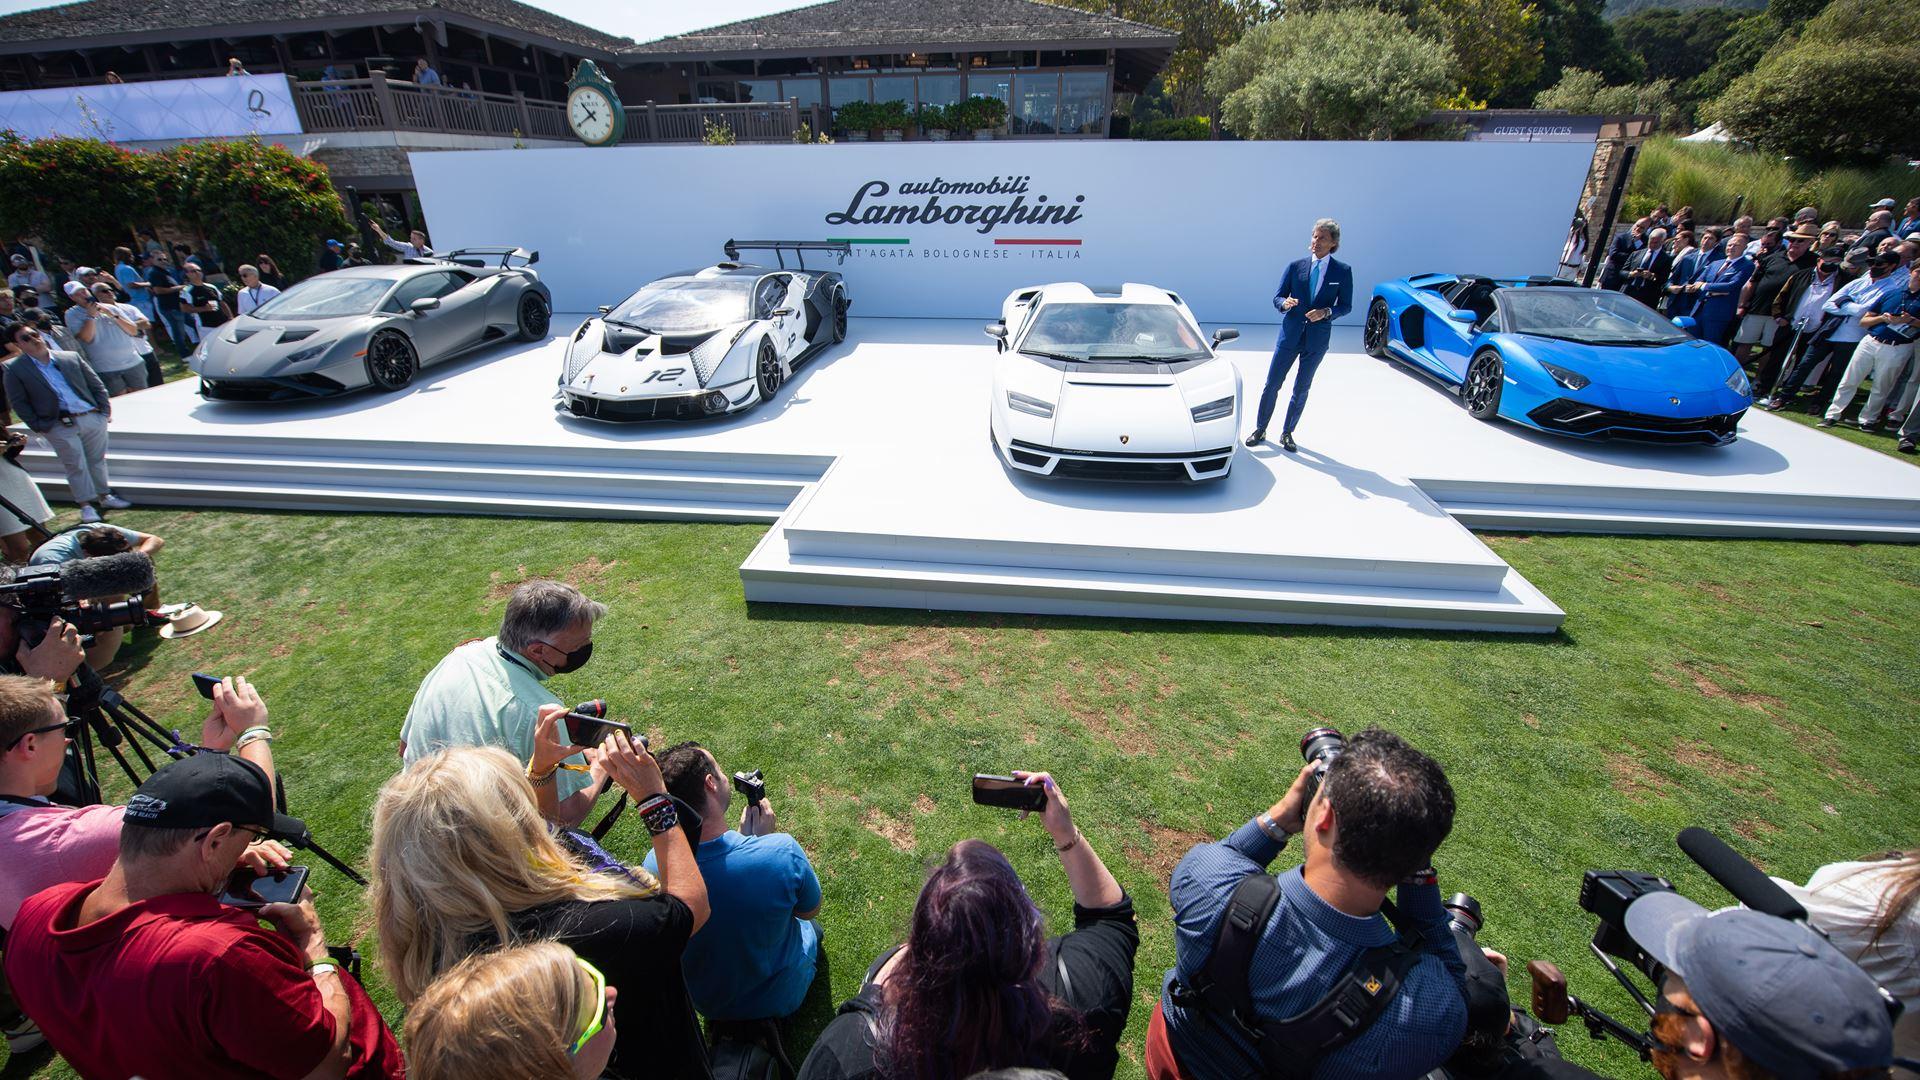 Lamborghini Kicks Off Monterey Car Week with Countach LPI 800-4 Global Debut at The Quail, A Motorsports Gathering - Image 8